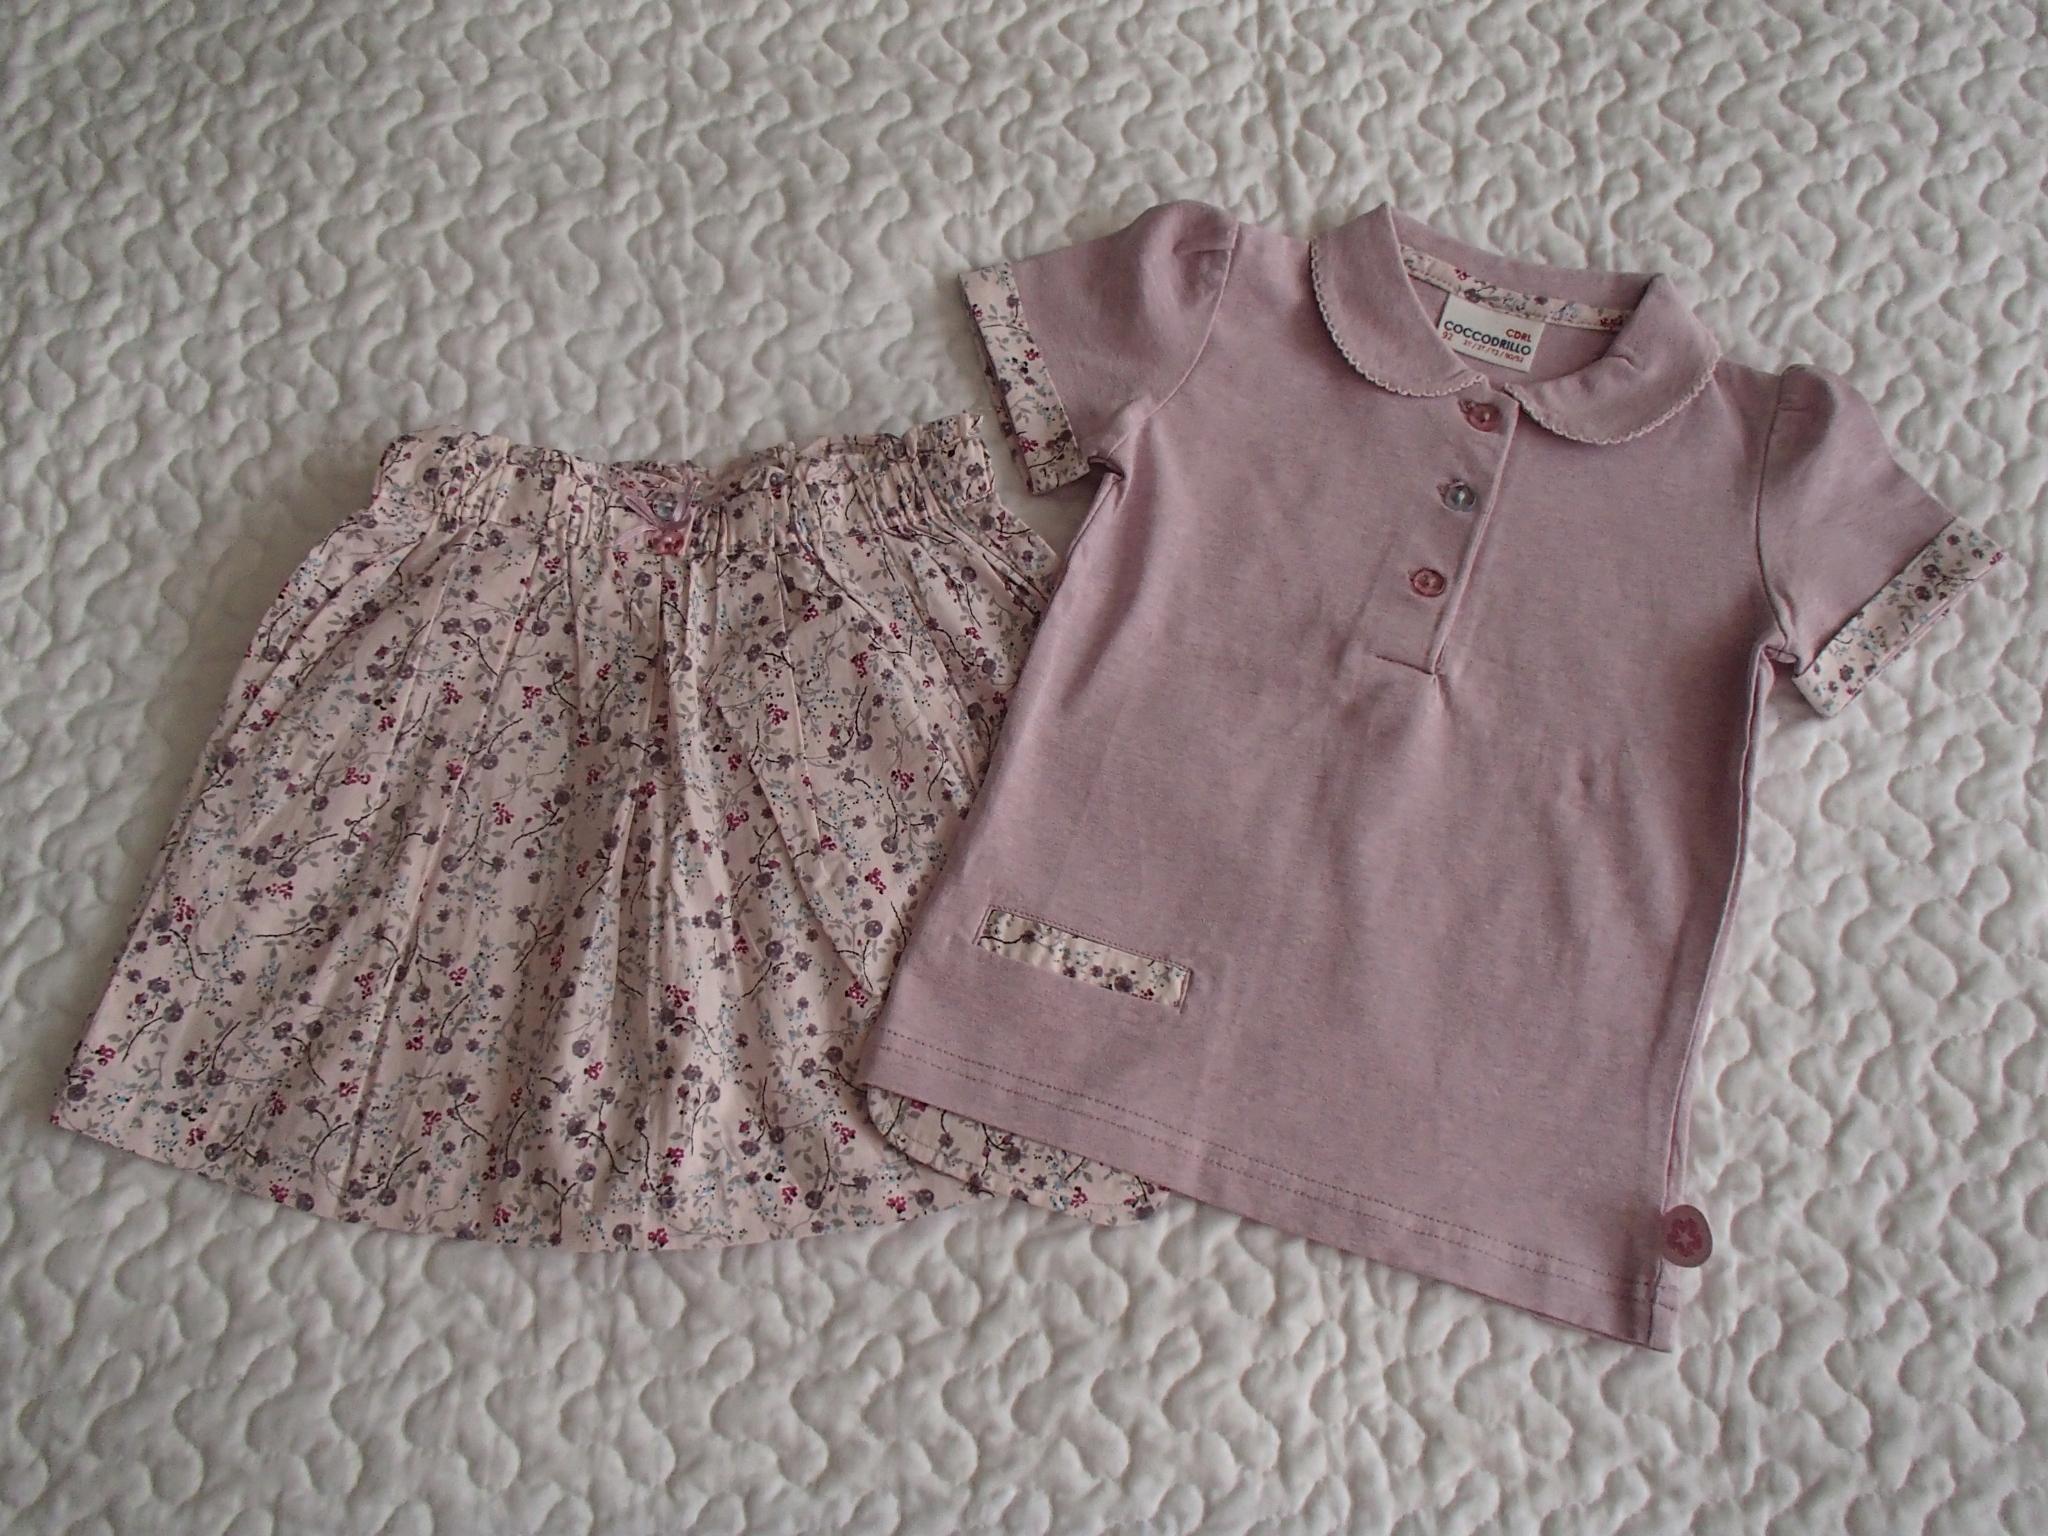 Coccodrillo bluzka spódnica fiolet nowe roz 92